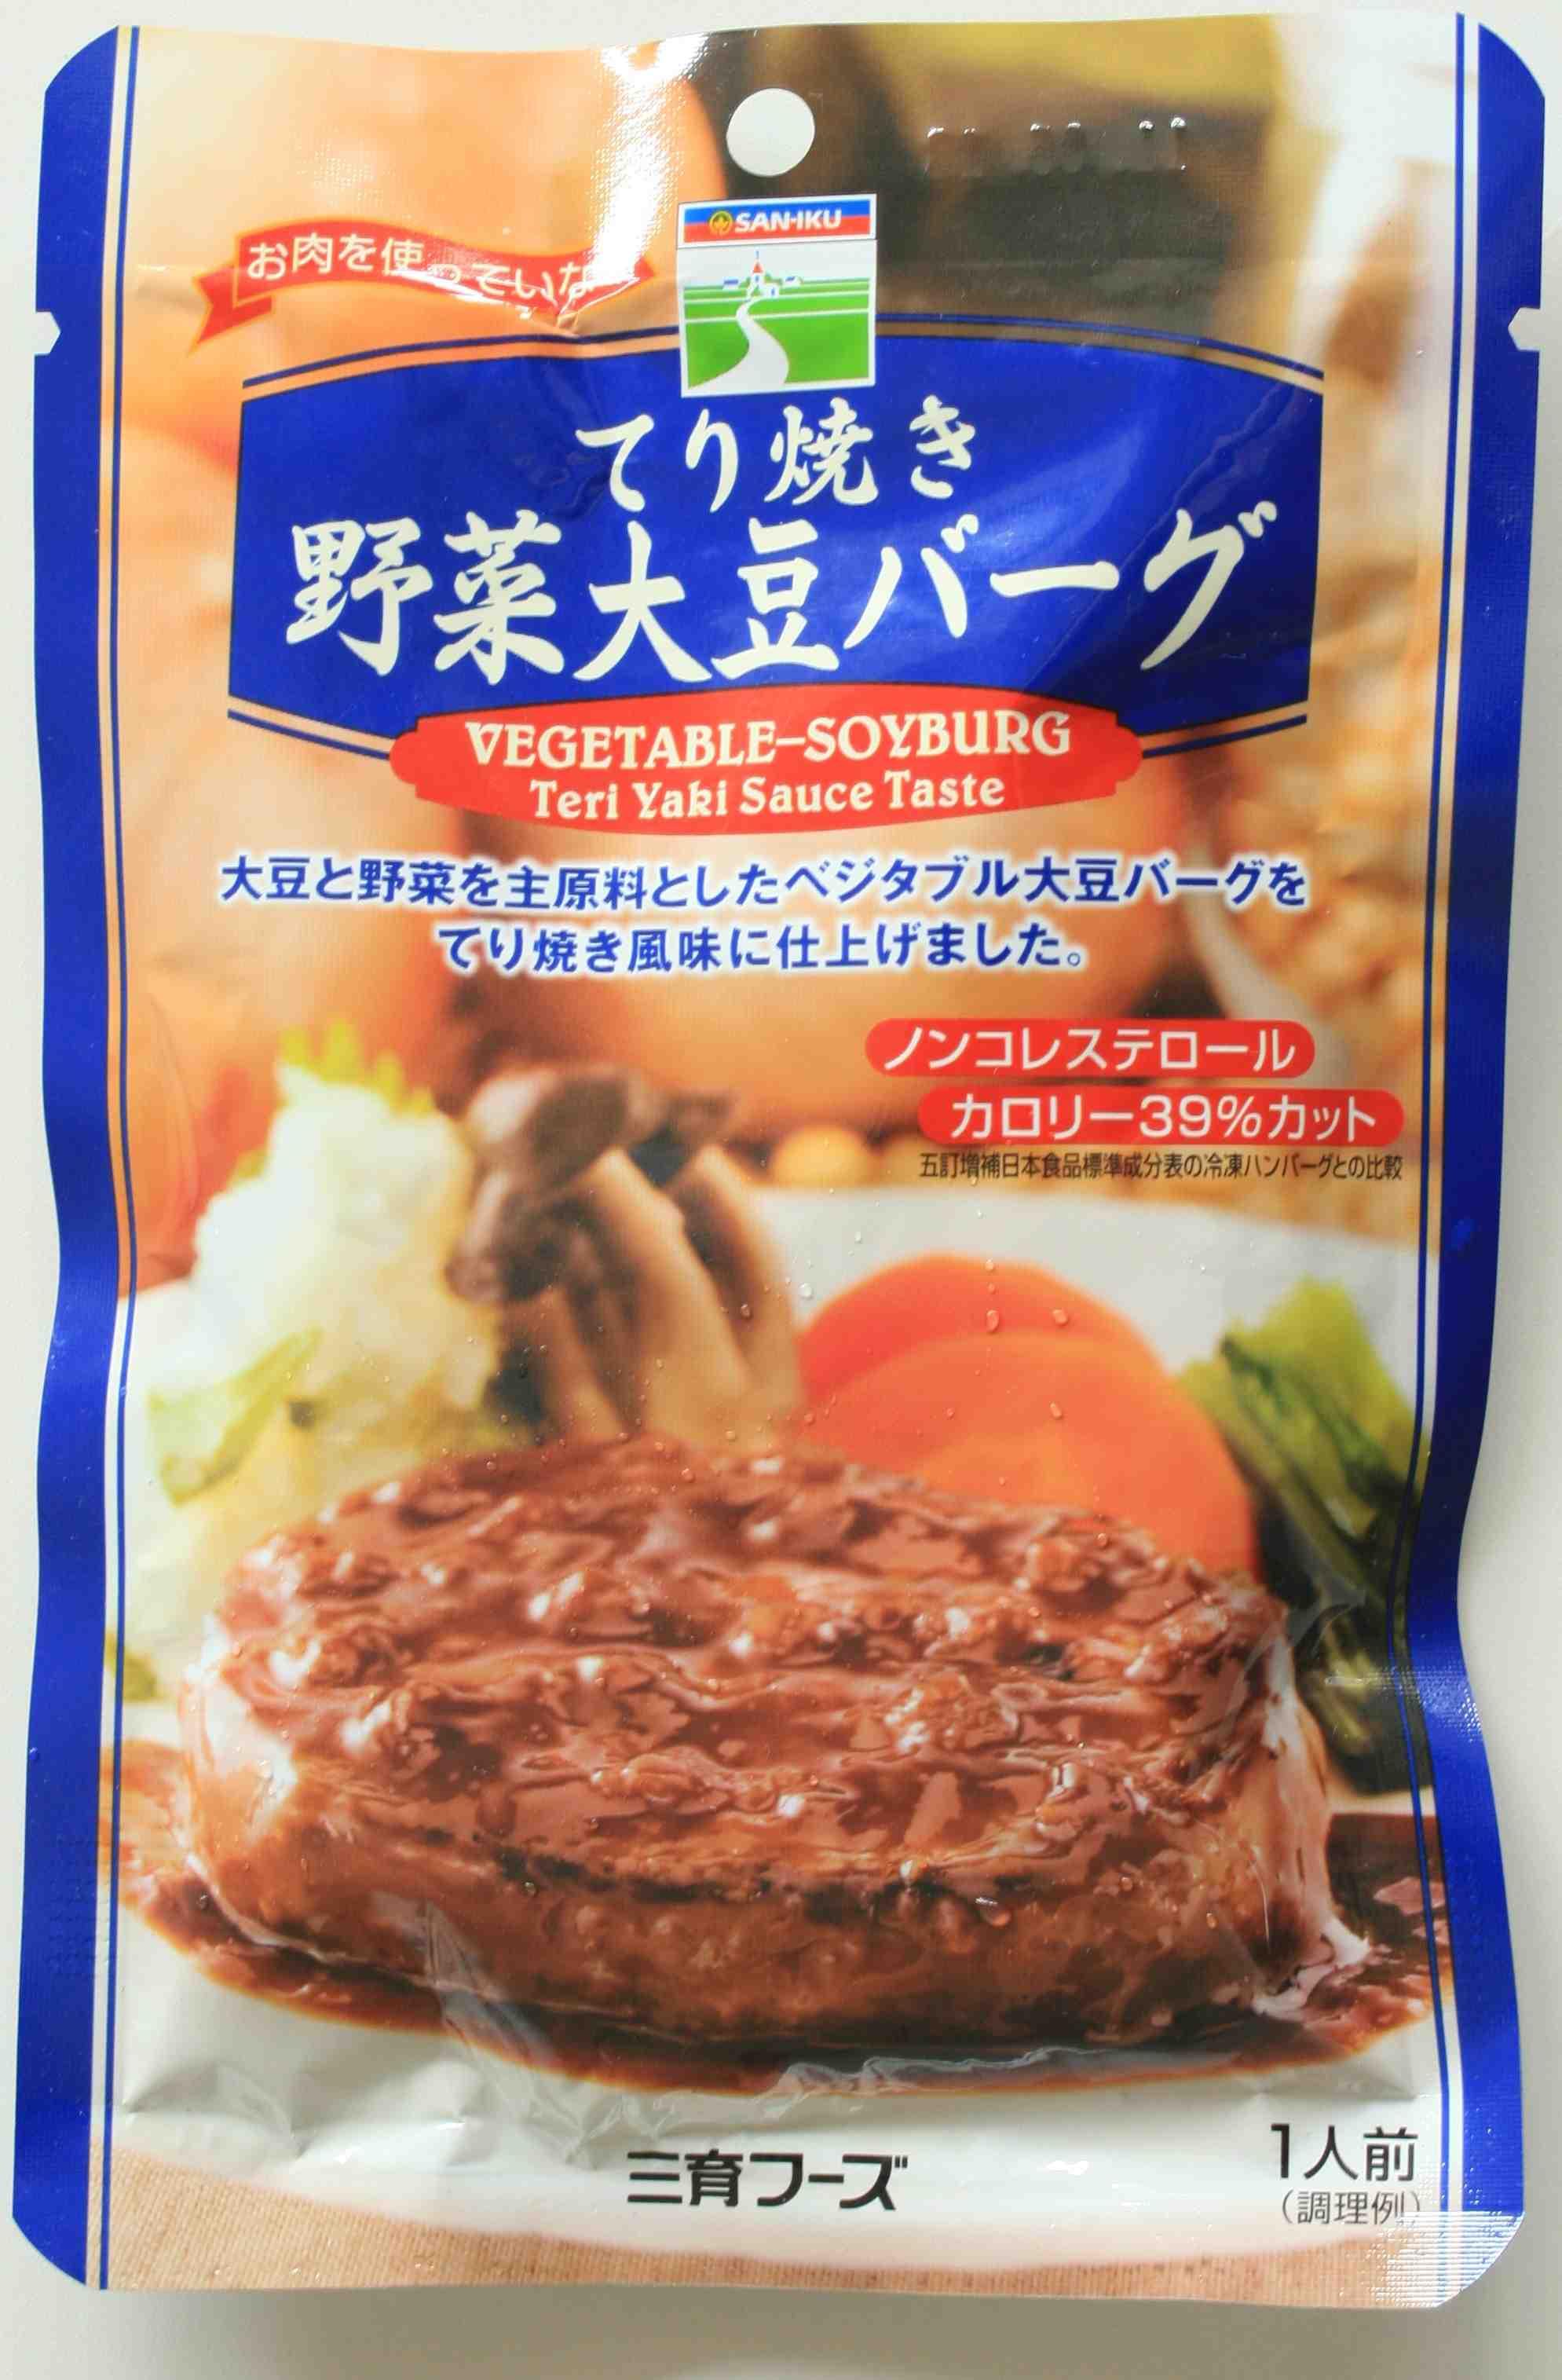 Teriyaki soy burger